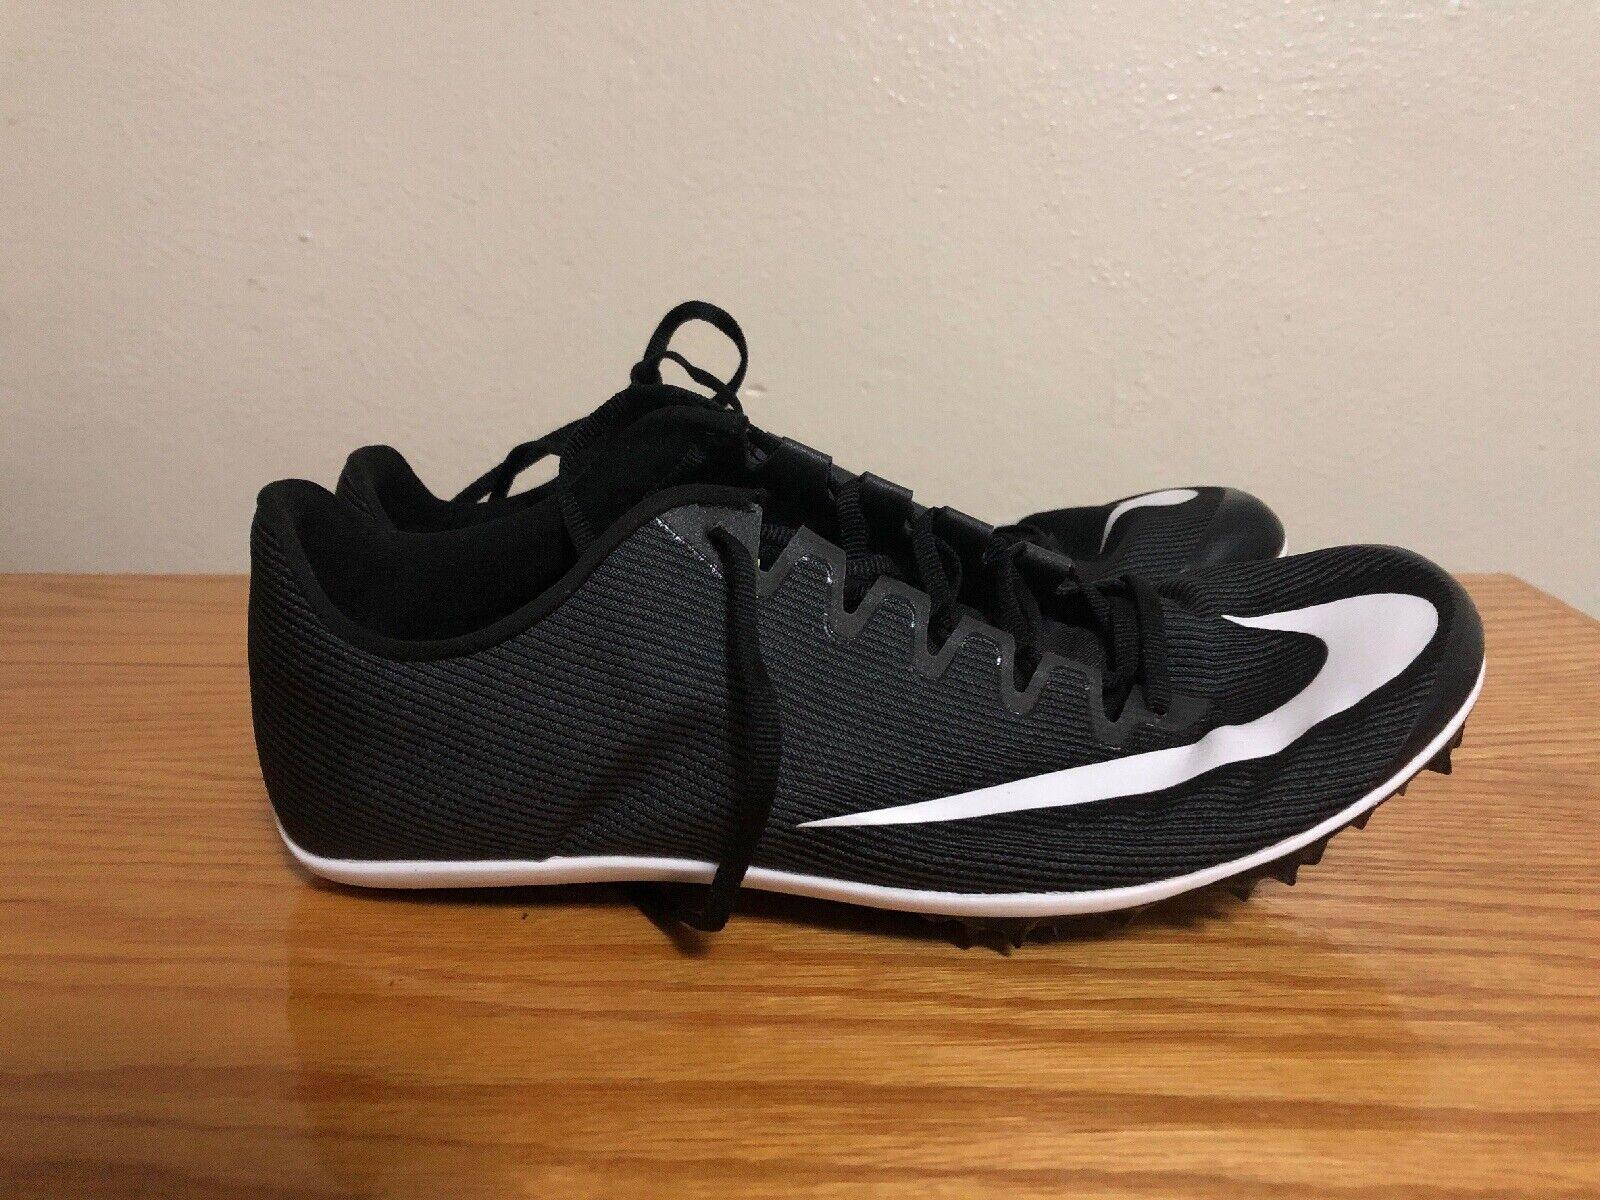 Nike Zoom 400 400 400 Spår Spikes AA1205 001 Män 65533;65533;s Storlek 6  kolla in det billigaste